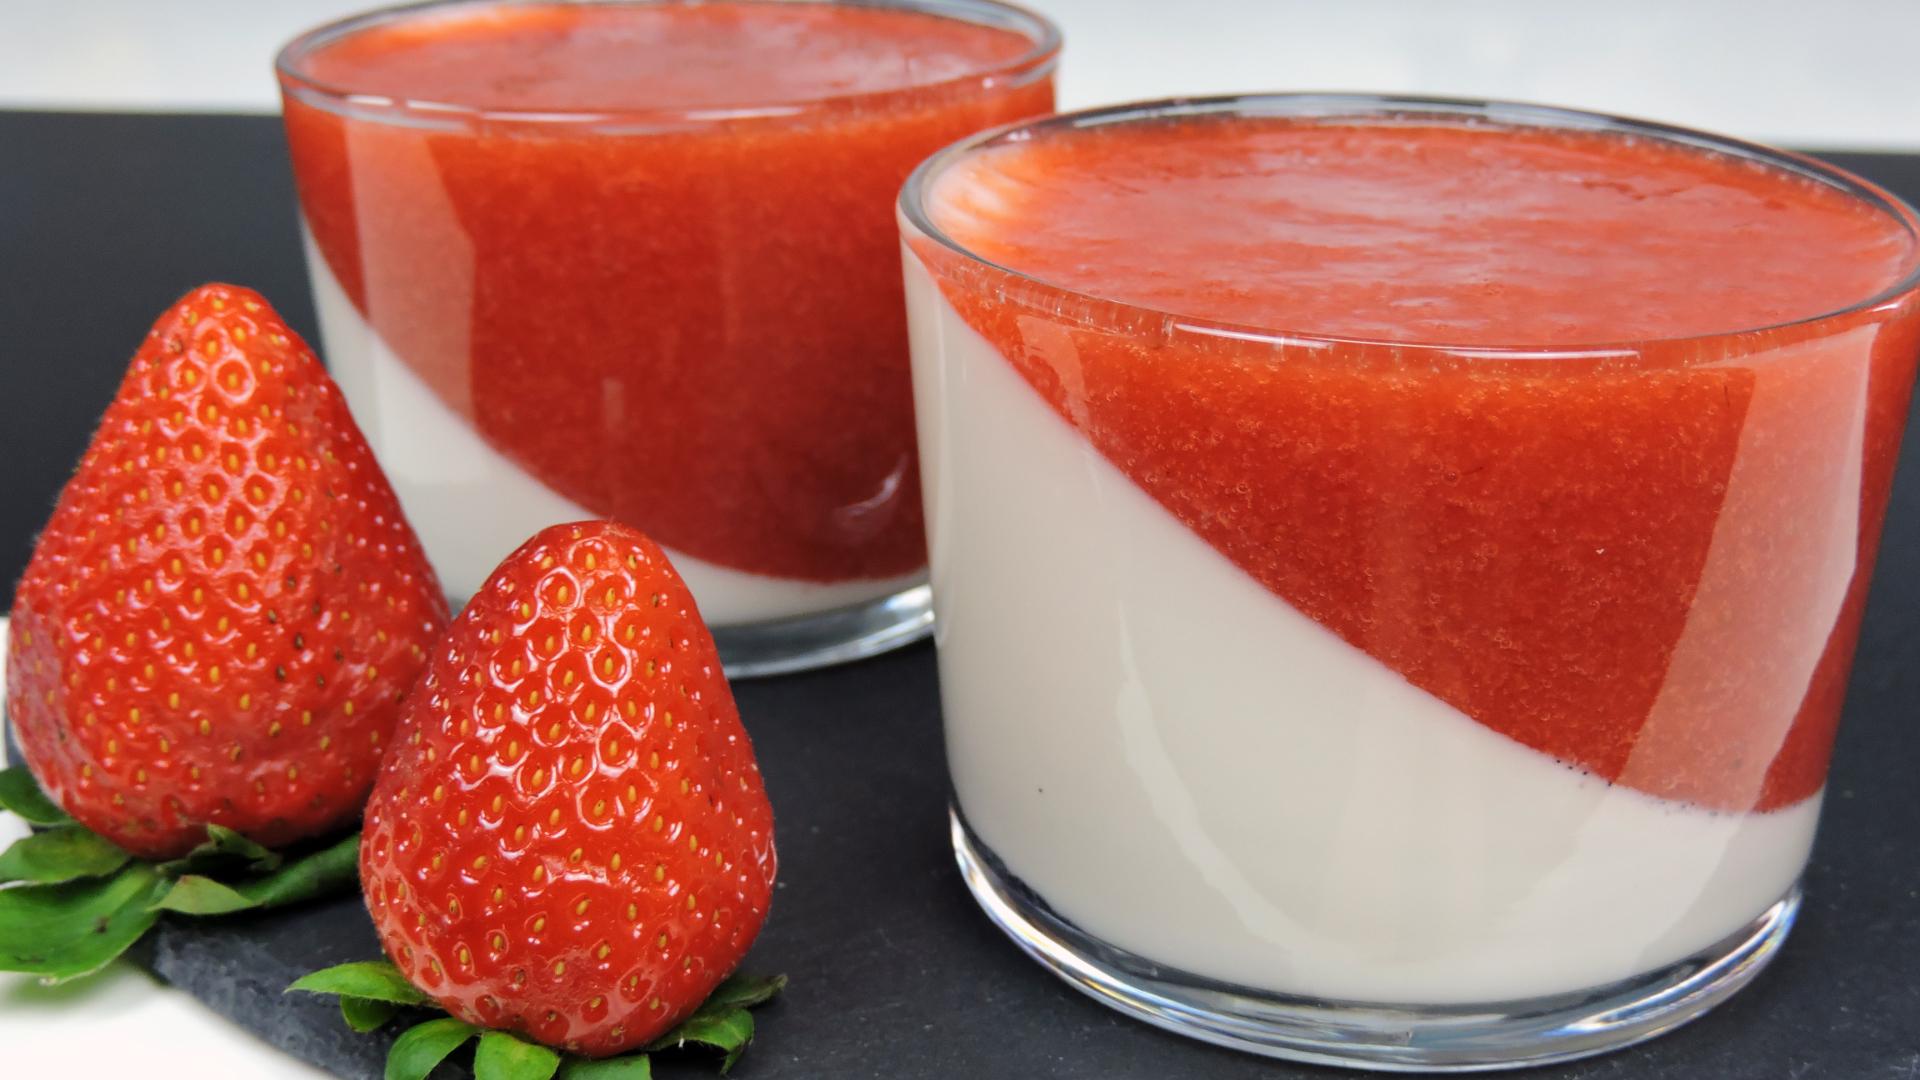 Panacota con salsa de fresas (Panna Cotta)